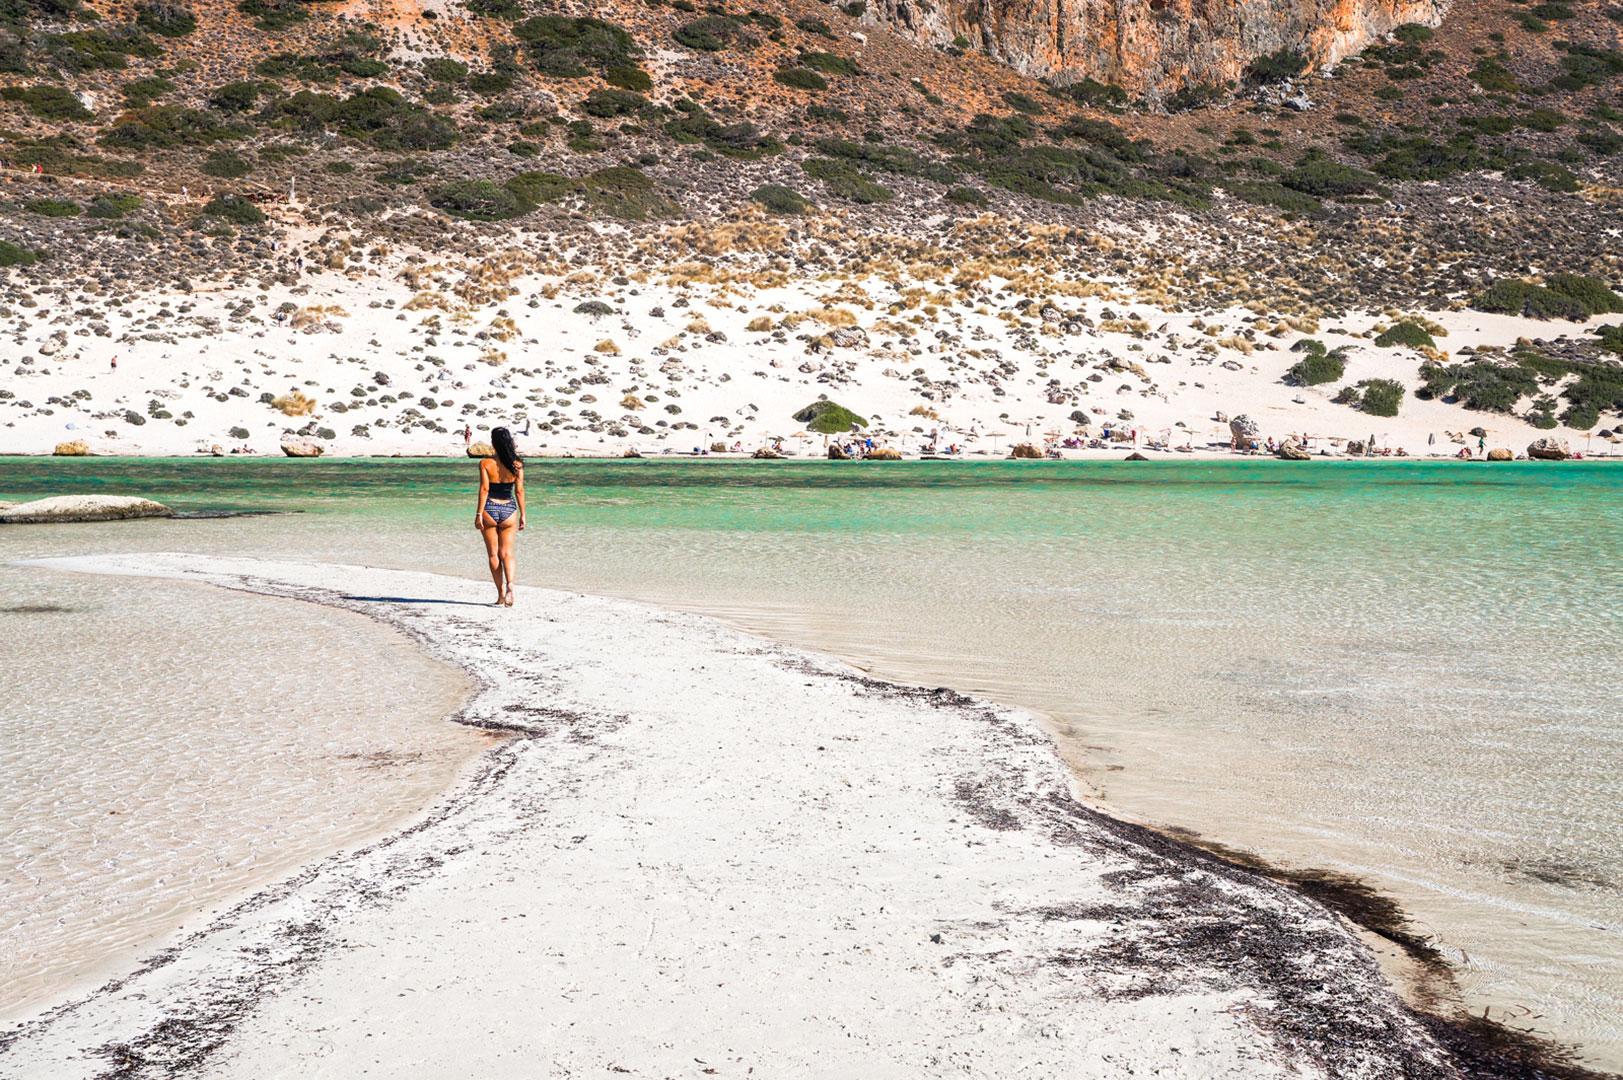 balos-chania-crete-greece-la-vie-en-blog-all-rights-reserved-8